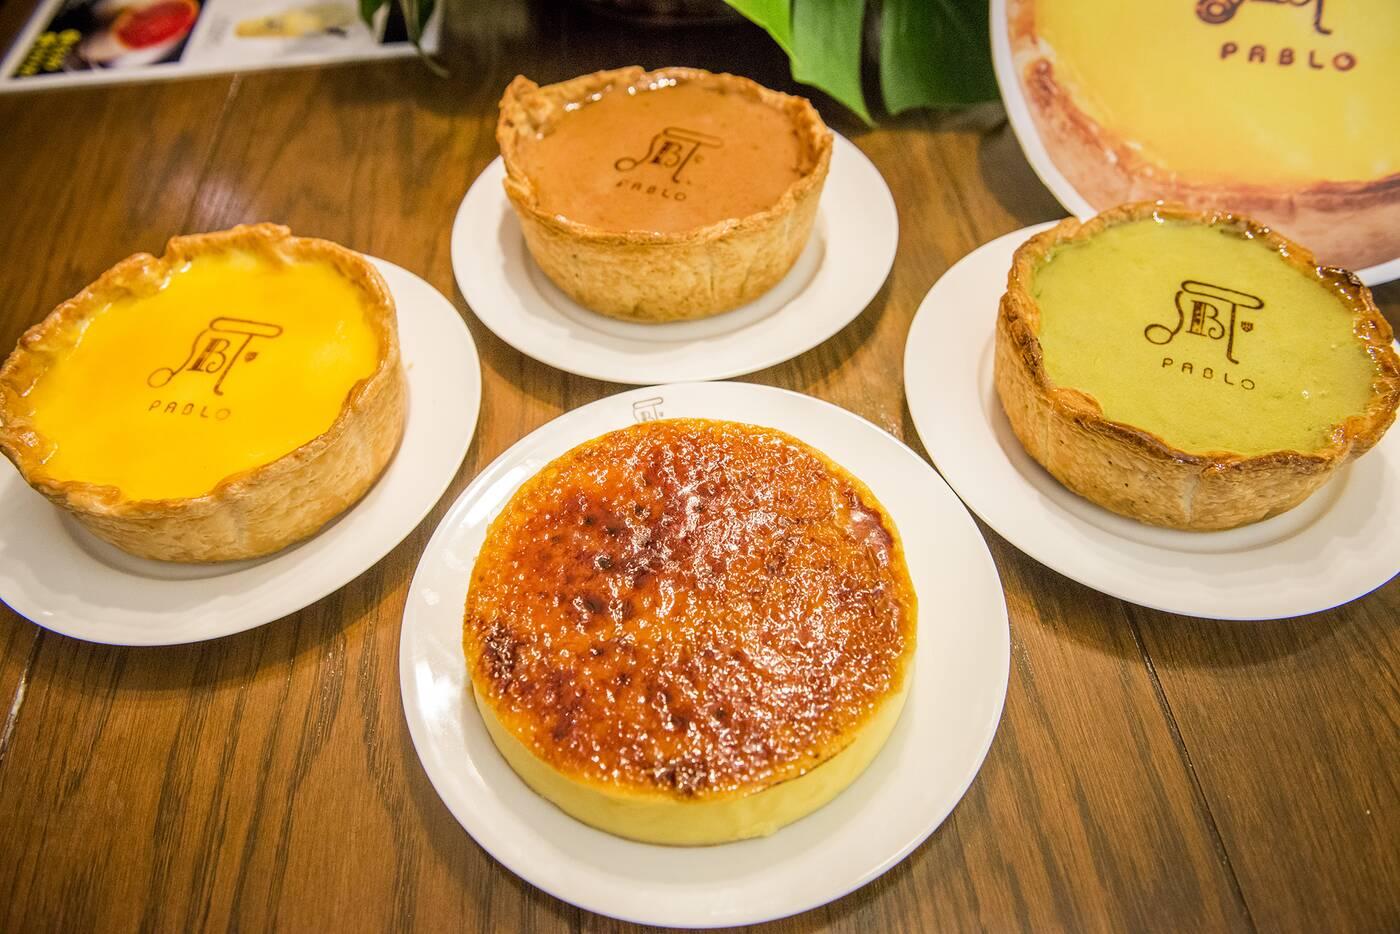 pablo cheese tarts